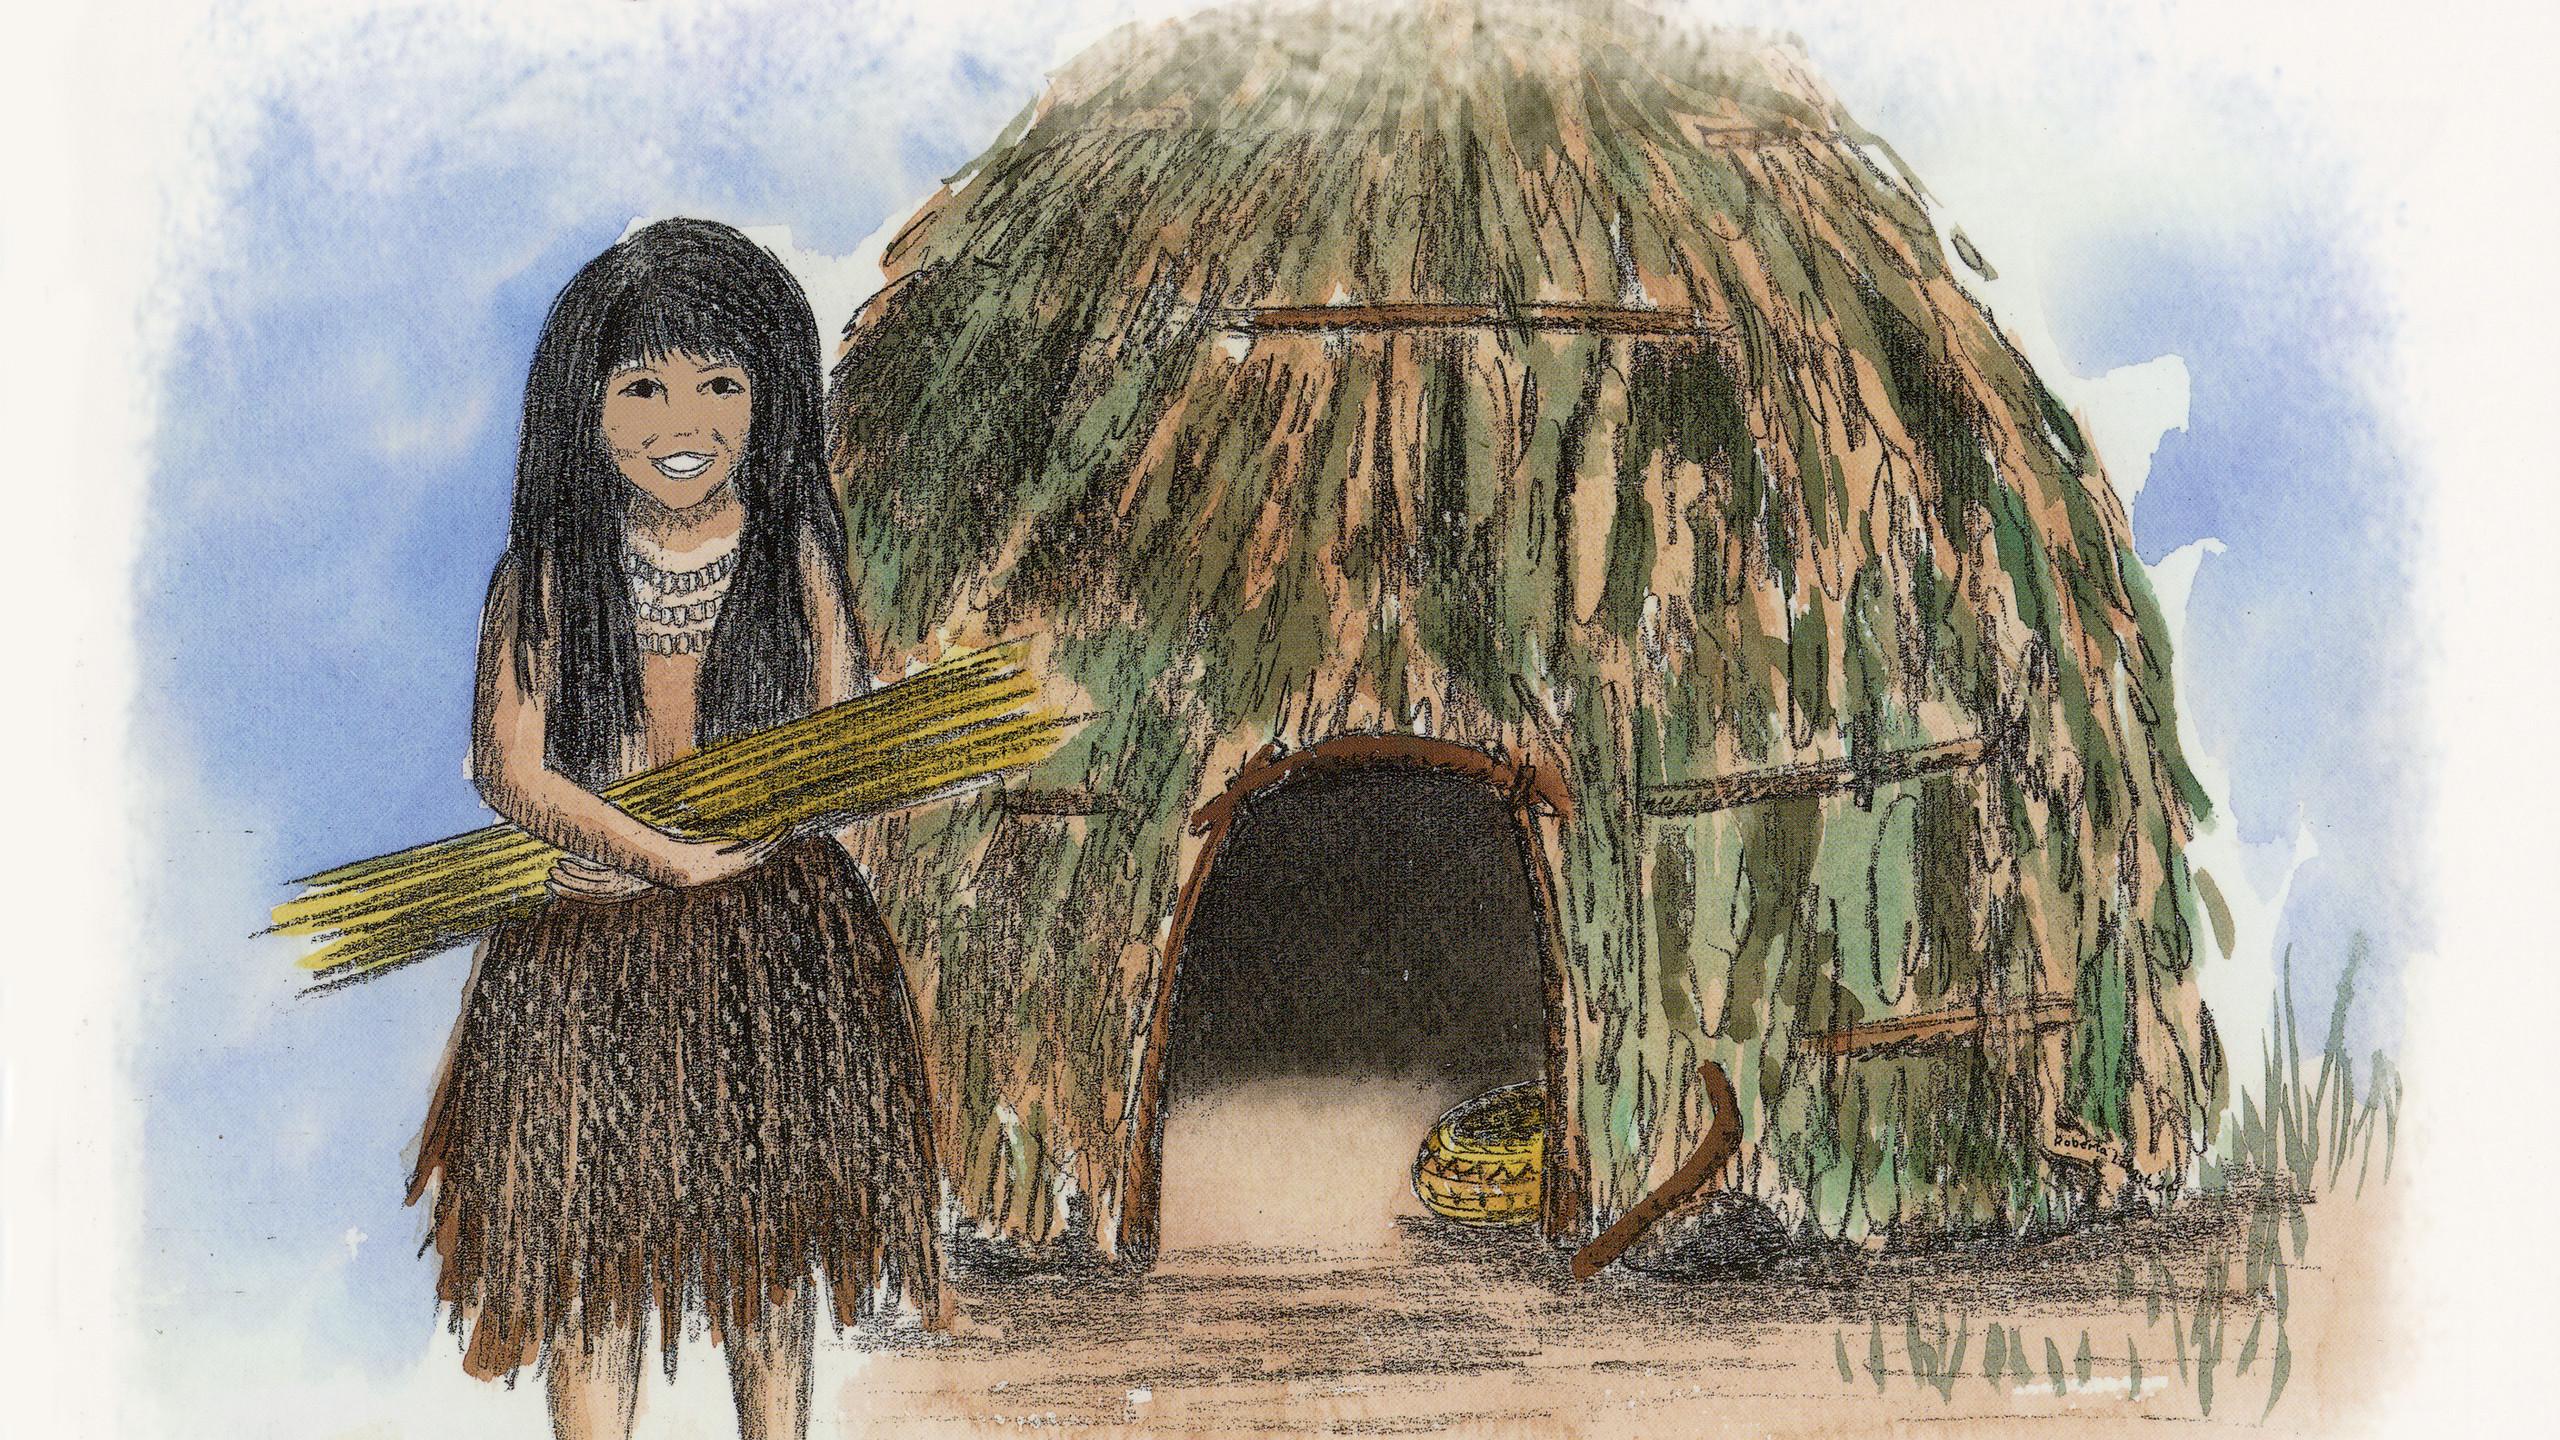 My Ancestors' Village